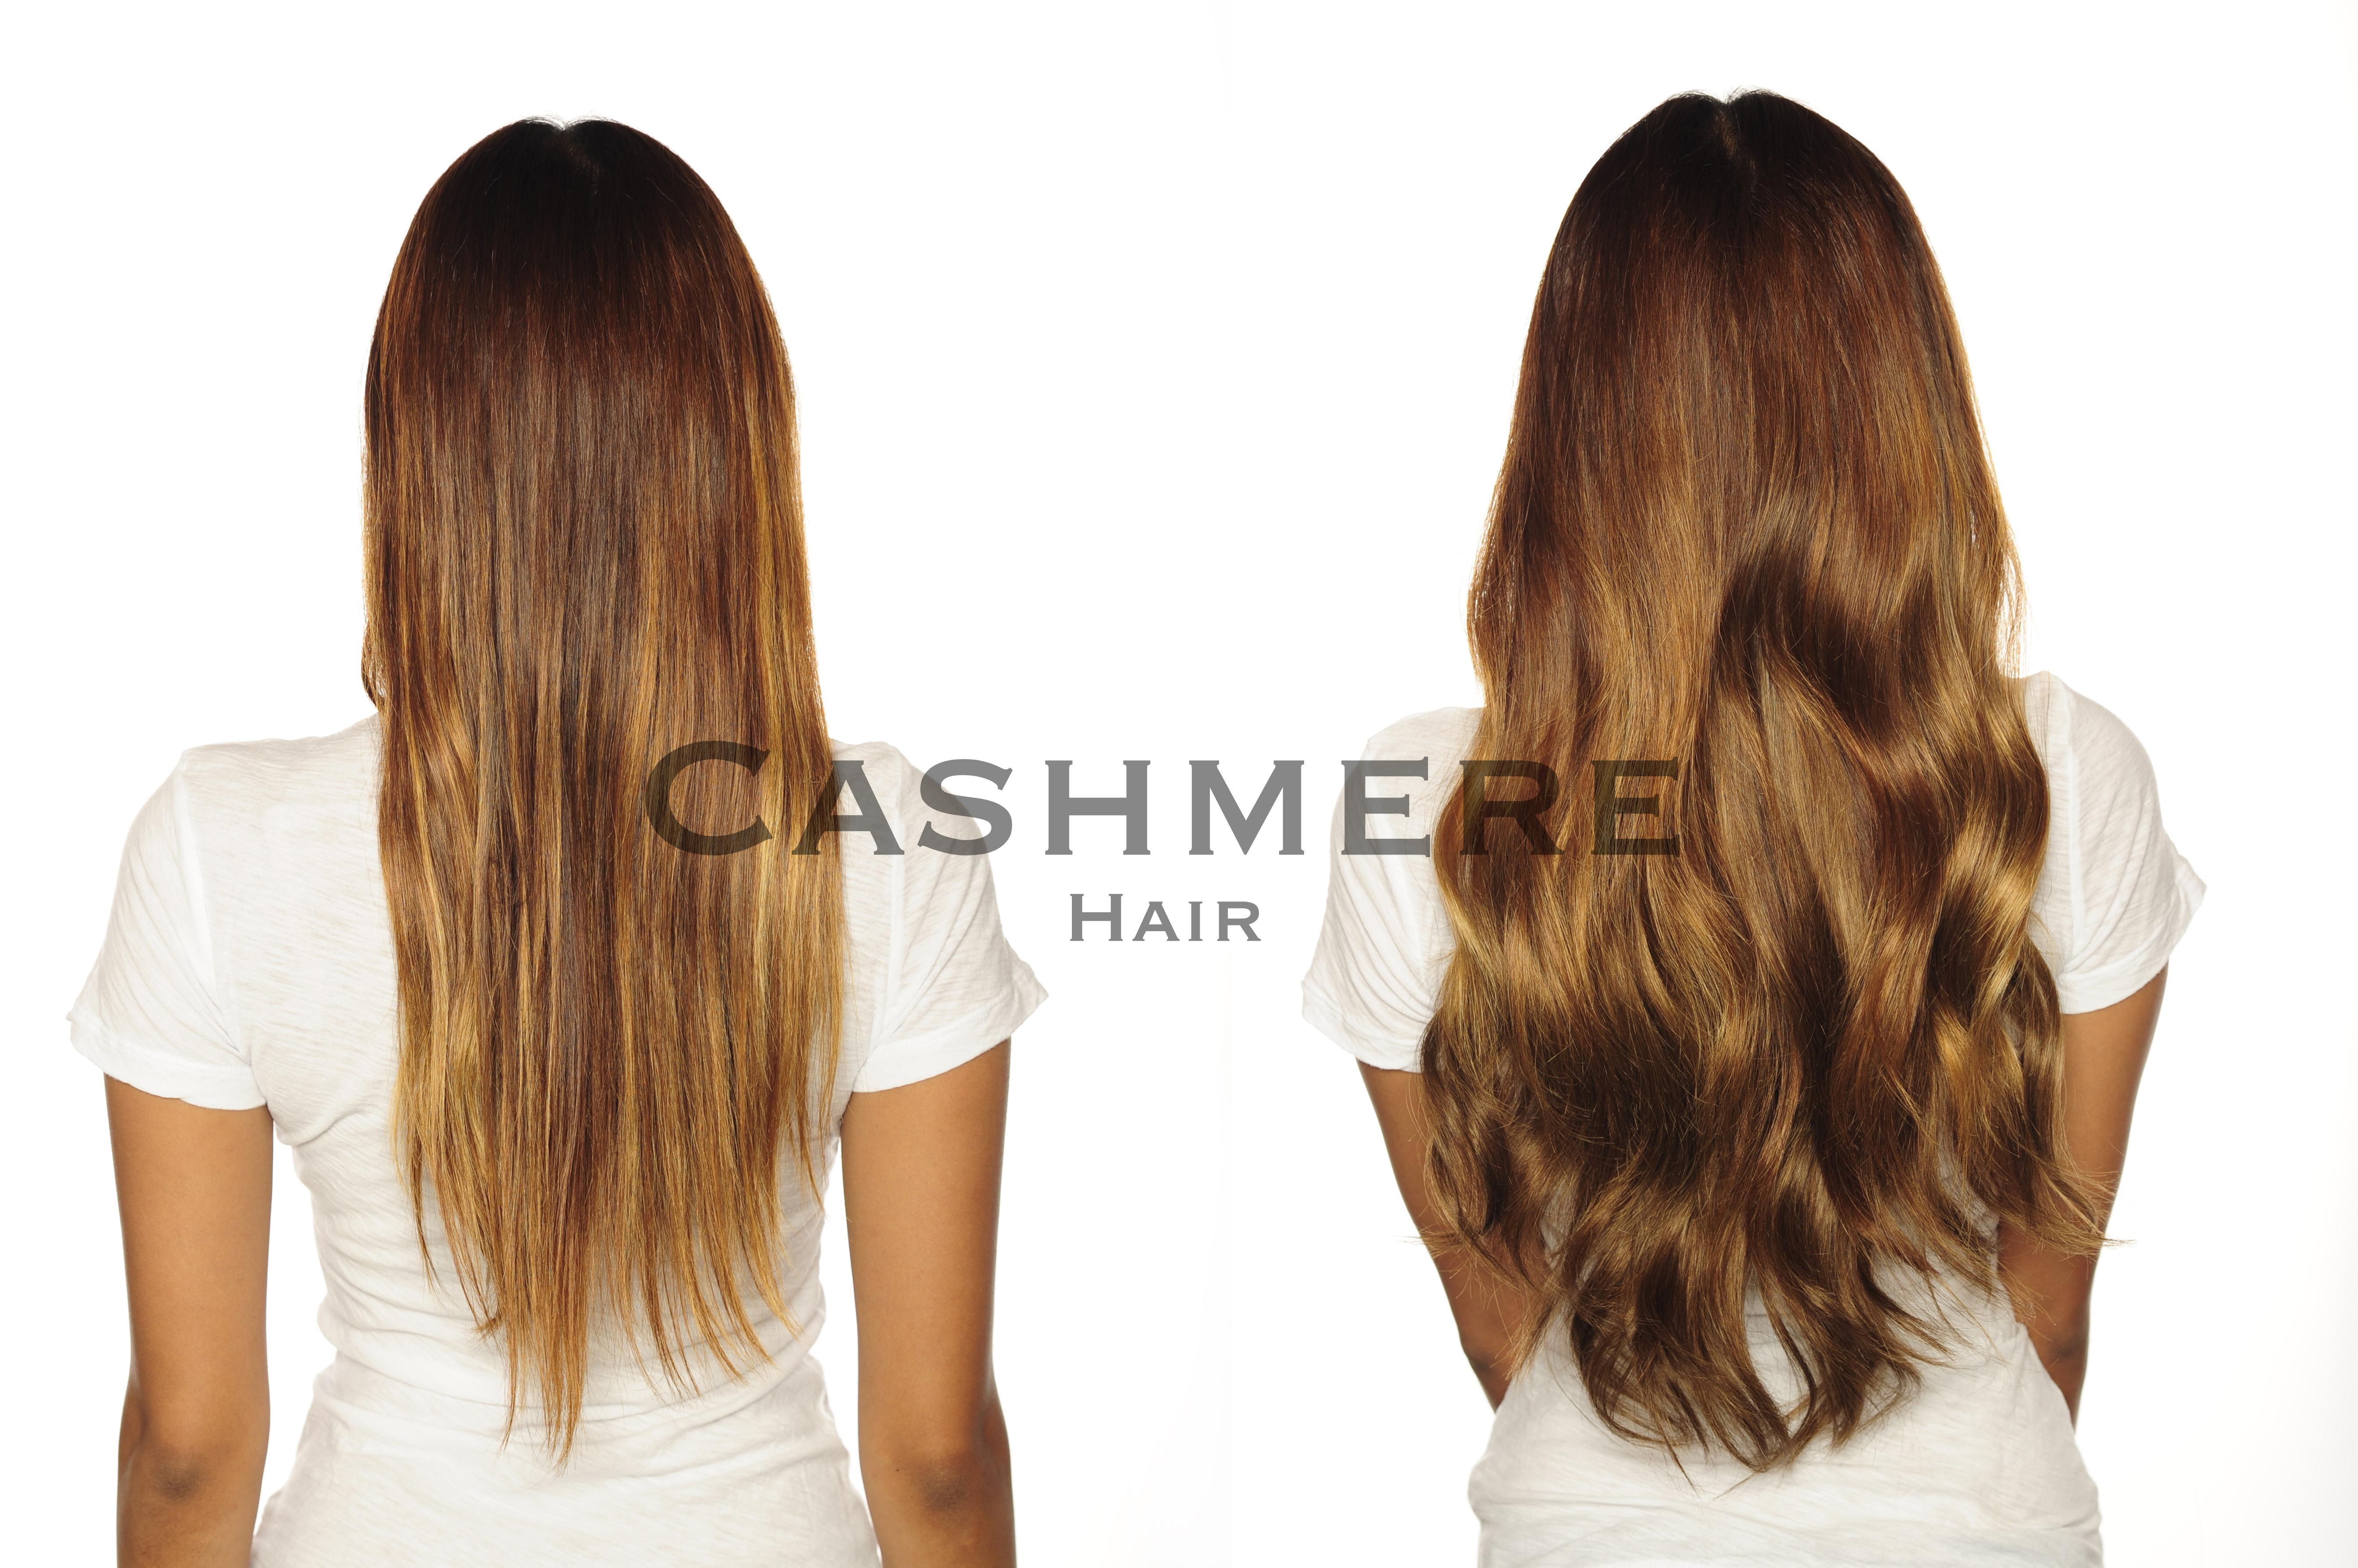 jackie cashmere hair back web2